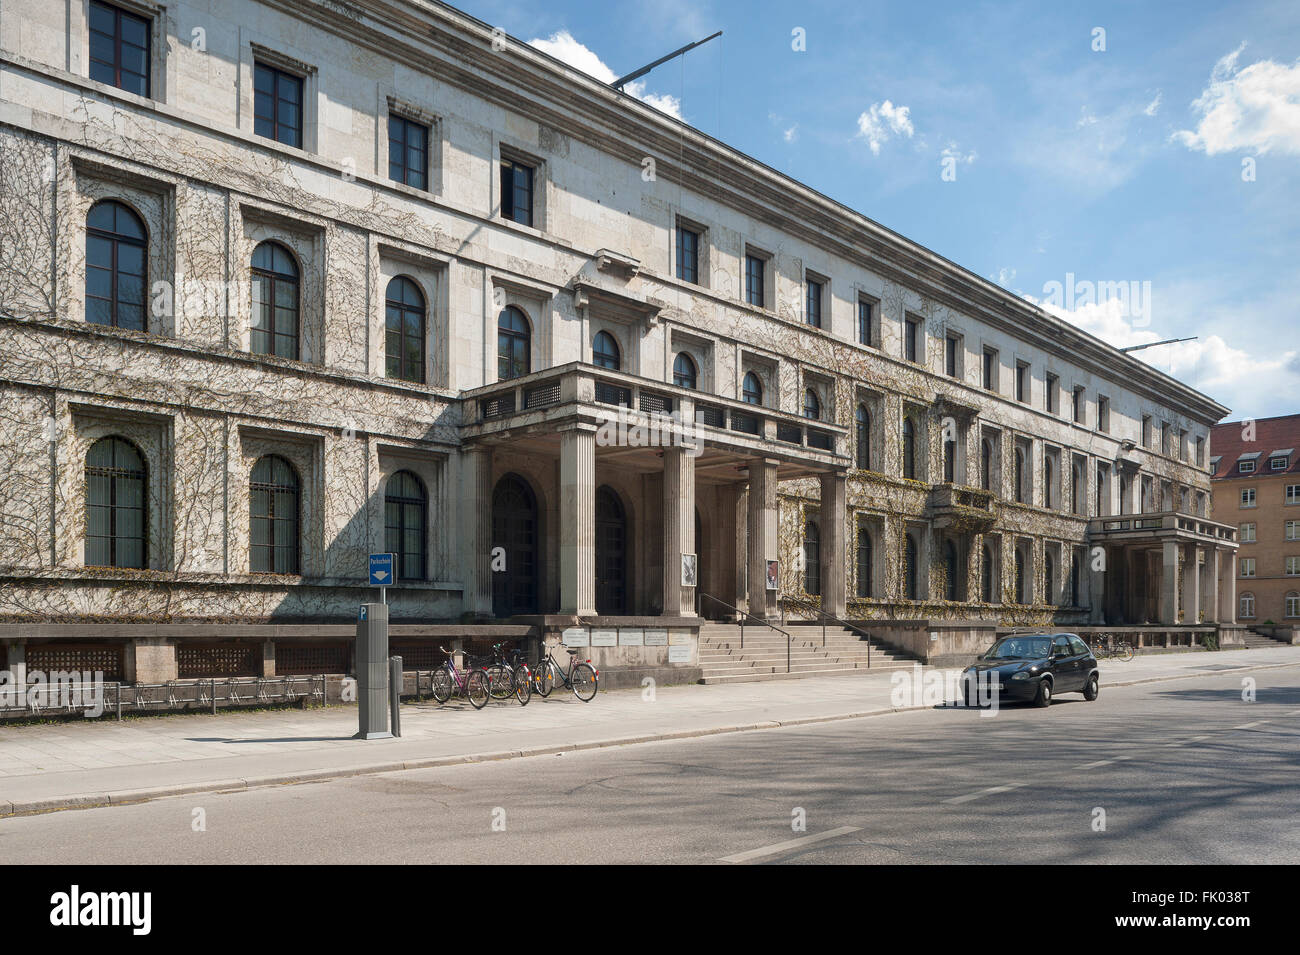 Münchner Haus der Kulturinstitute, former administrative building of the Nazi Party NSDAP, 1935, Munich, Bavaria, - Stock Image